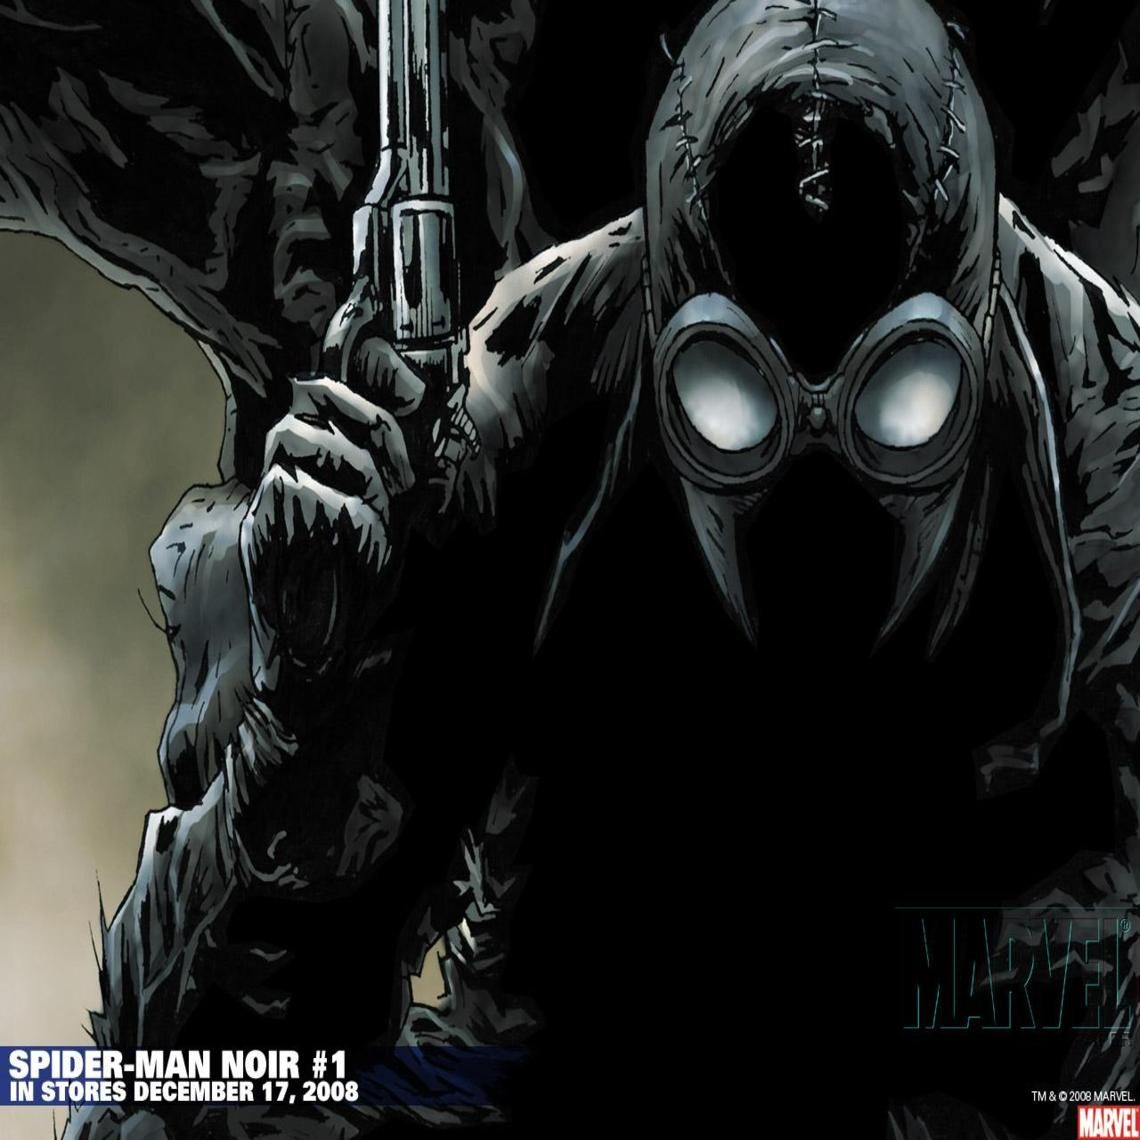 Spiderman Noir Wallpaper Ref Pinterest Spiderman Marvel And